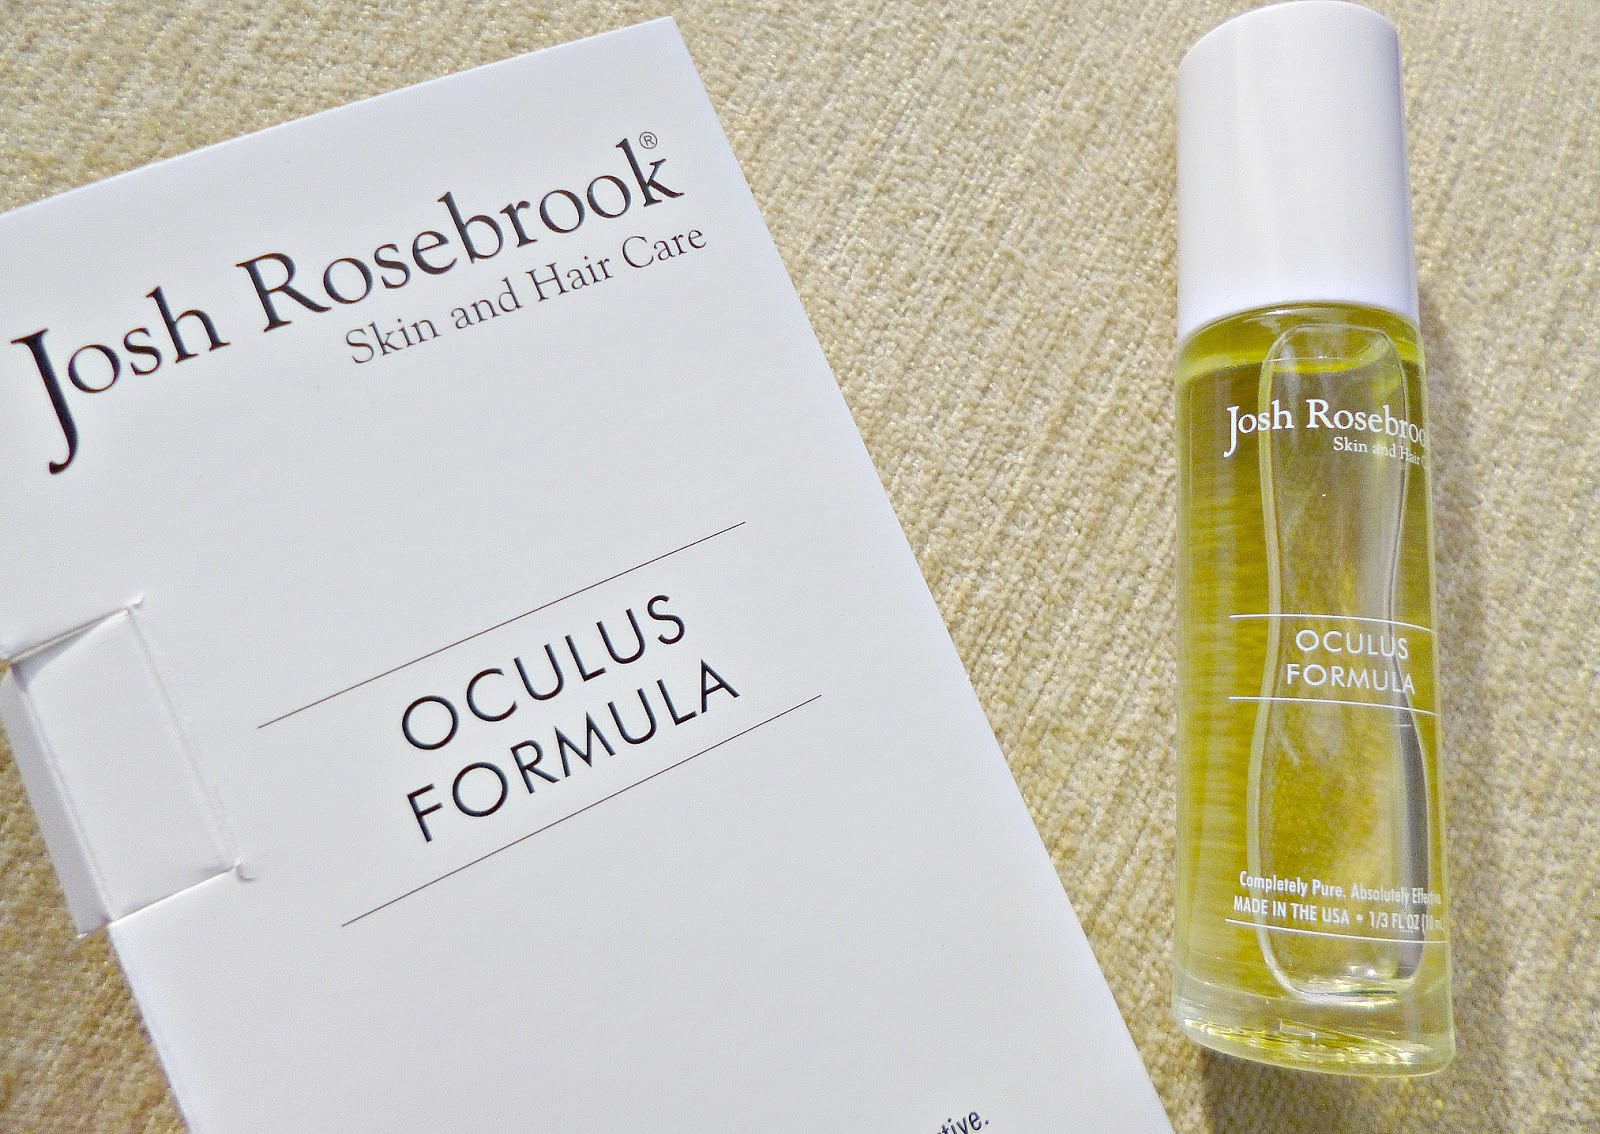 New in – Josh Rosebrook Oculus formula